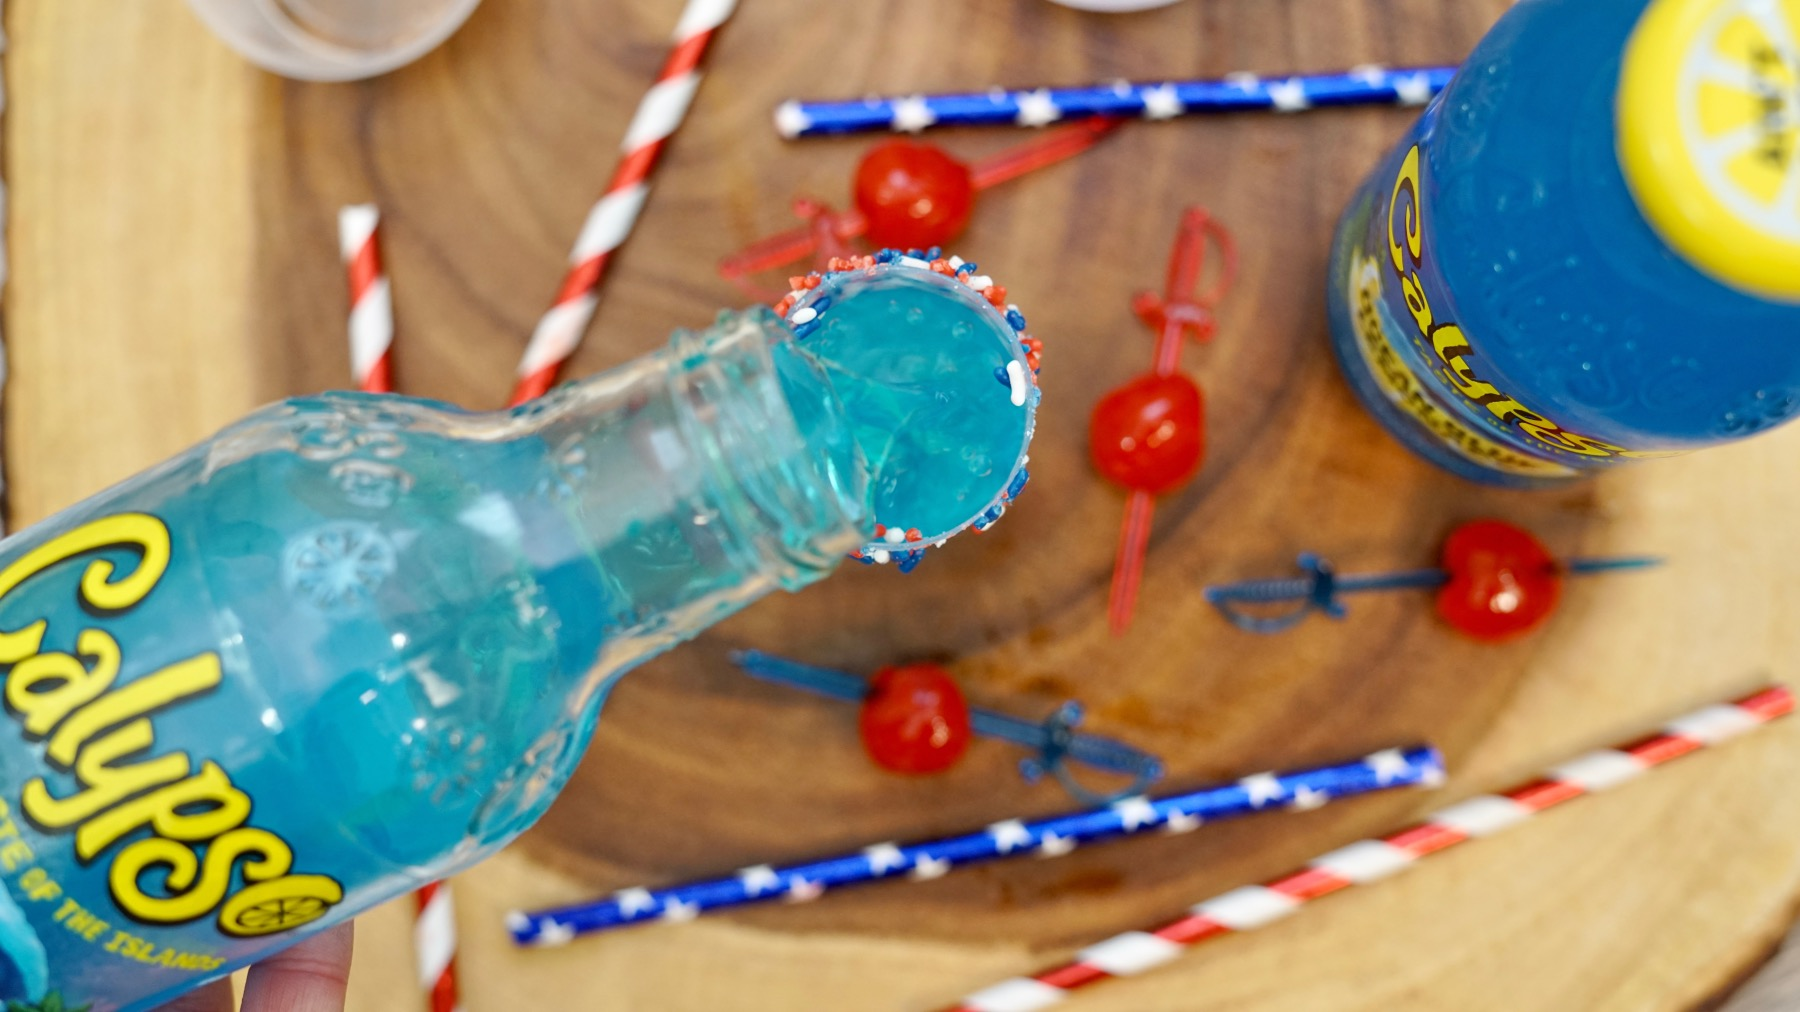 top the cocktail shot with calypso ocean blue lemonade